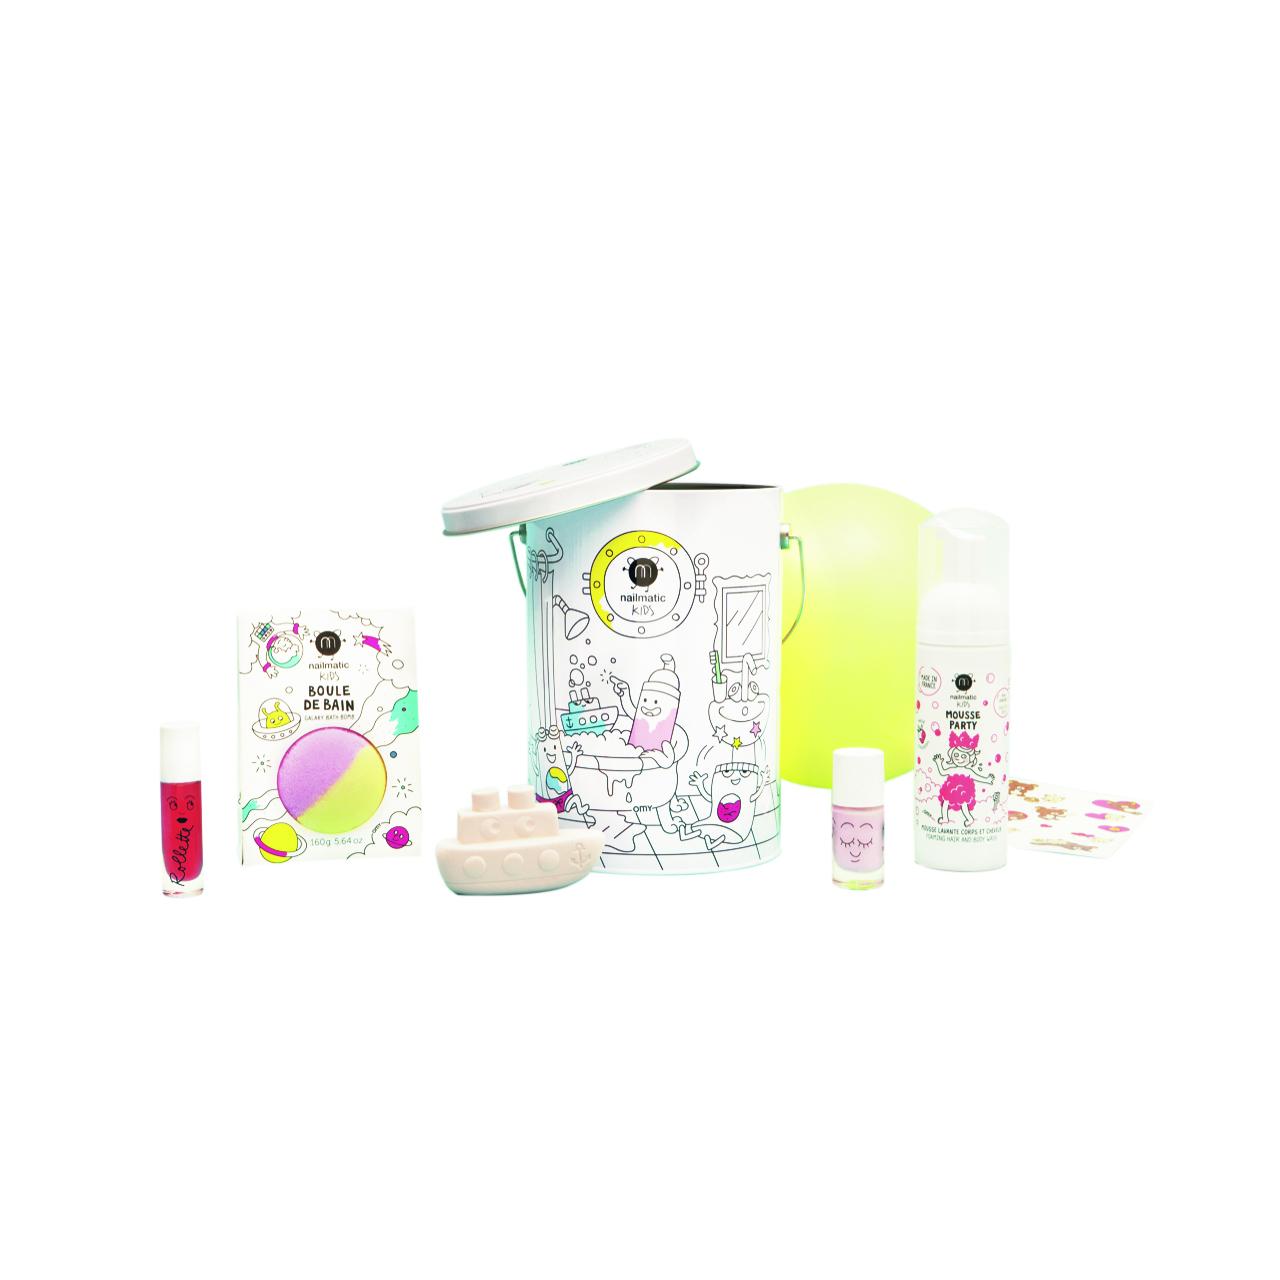 NMK_MAGIC BOX_WHITE BAKGROUND_PRINT.jpg